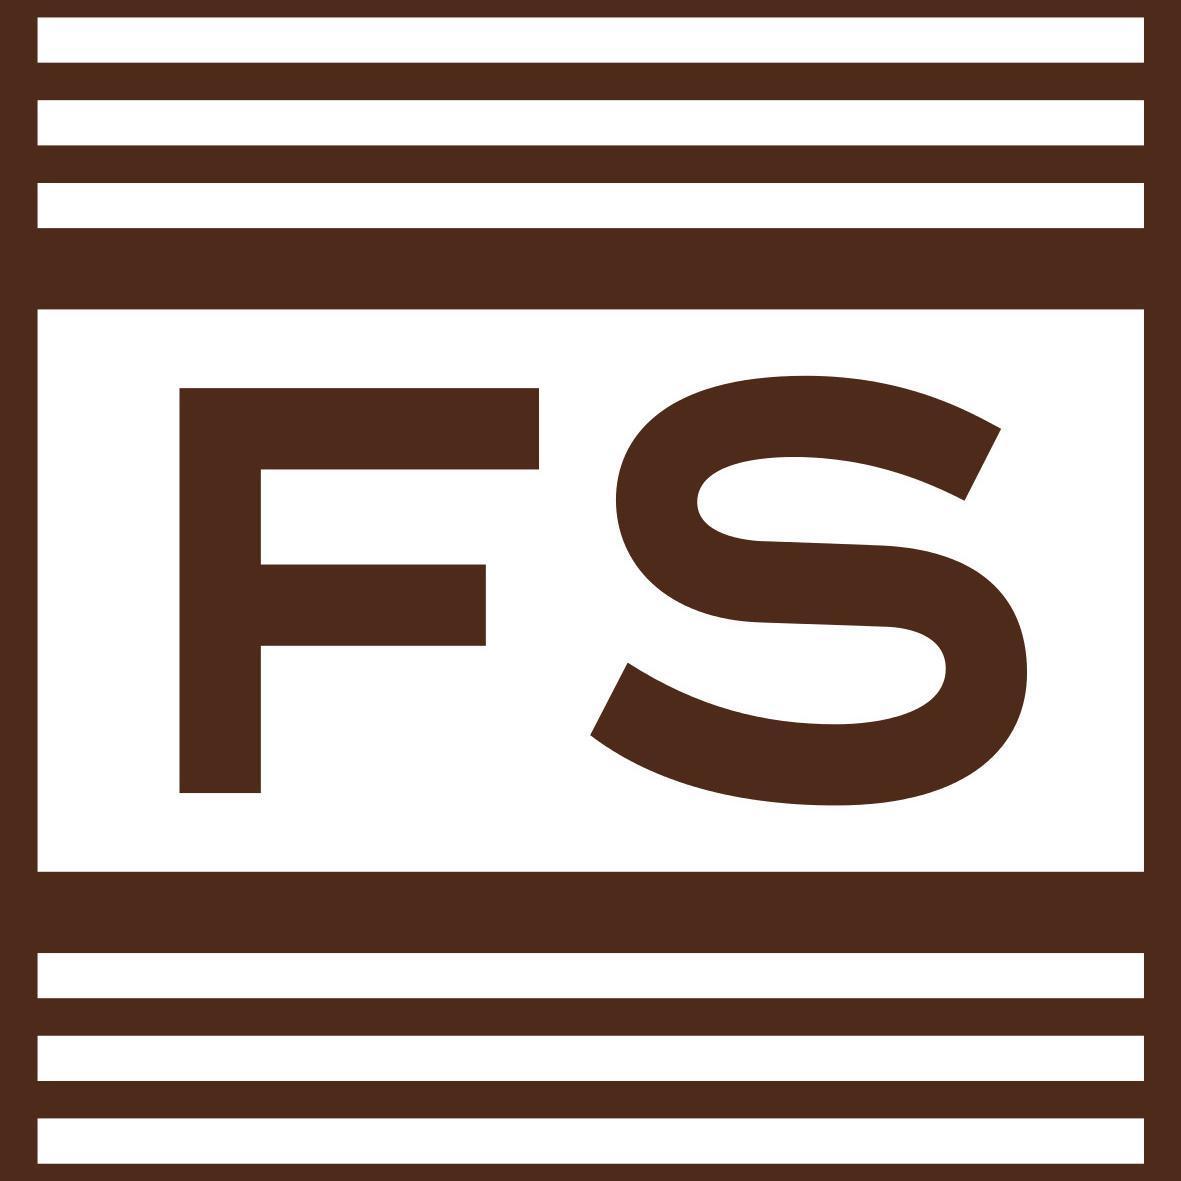 fs Logo (1).jpeg